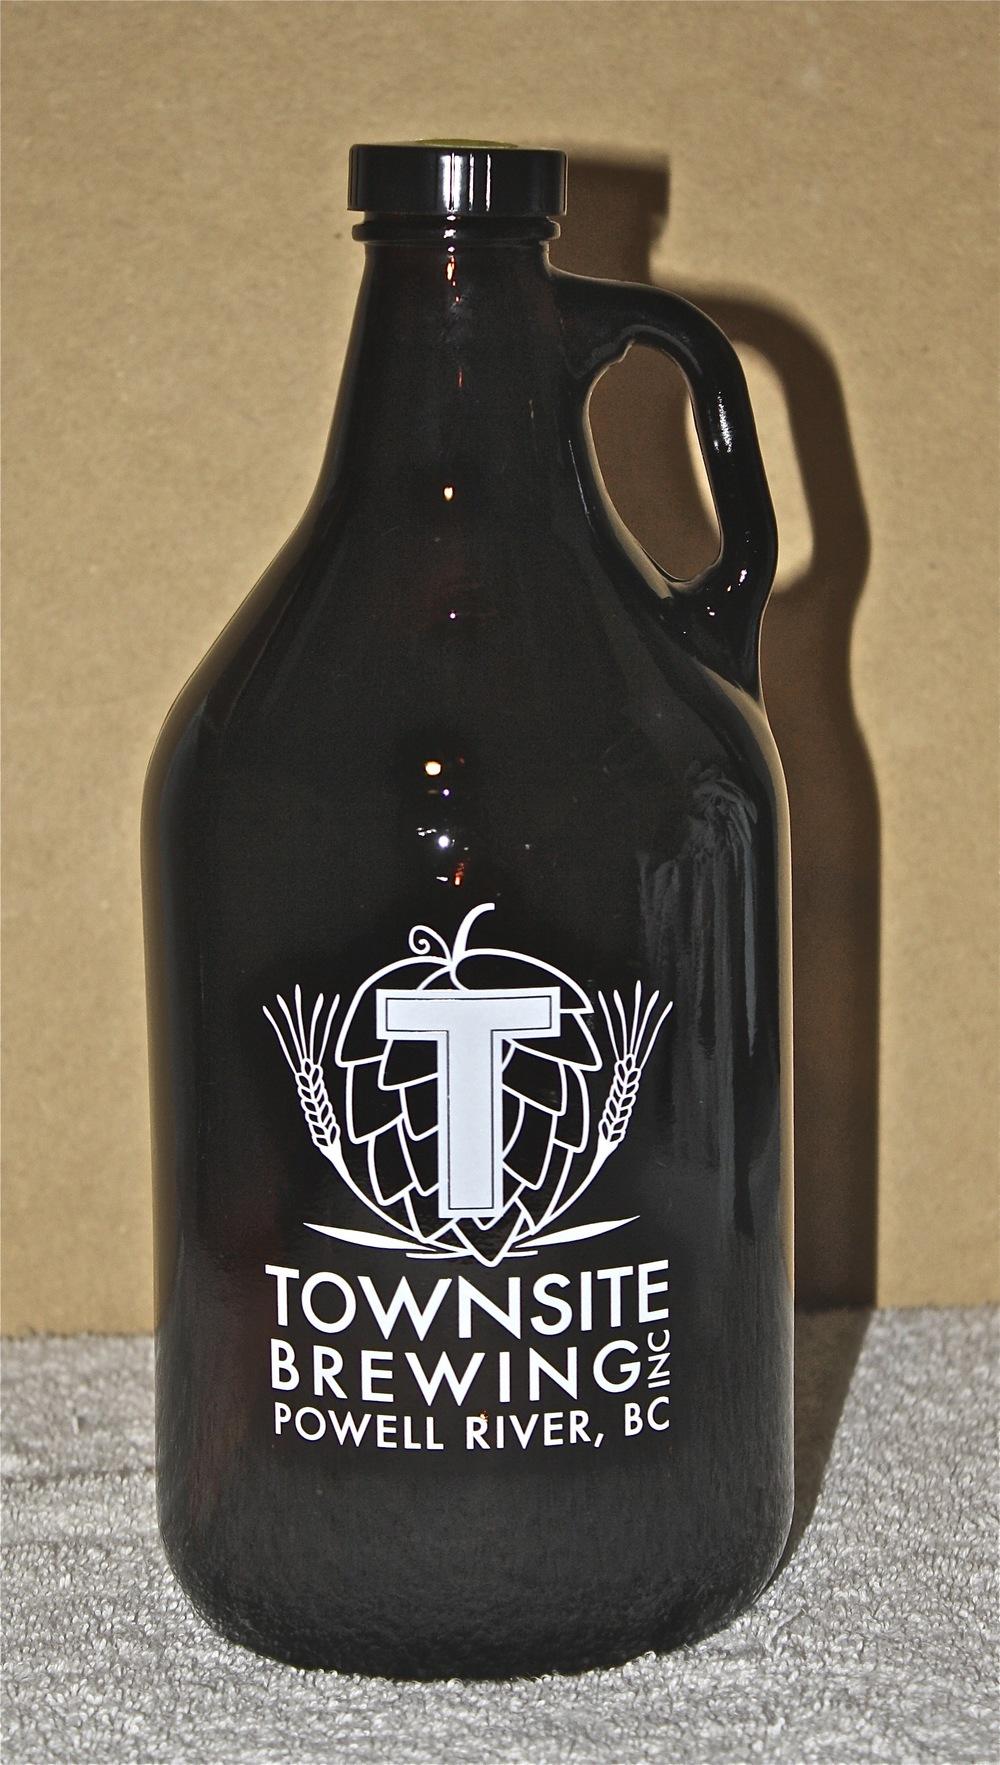 GR - Townsite Brewing (BC).jpg